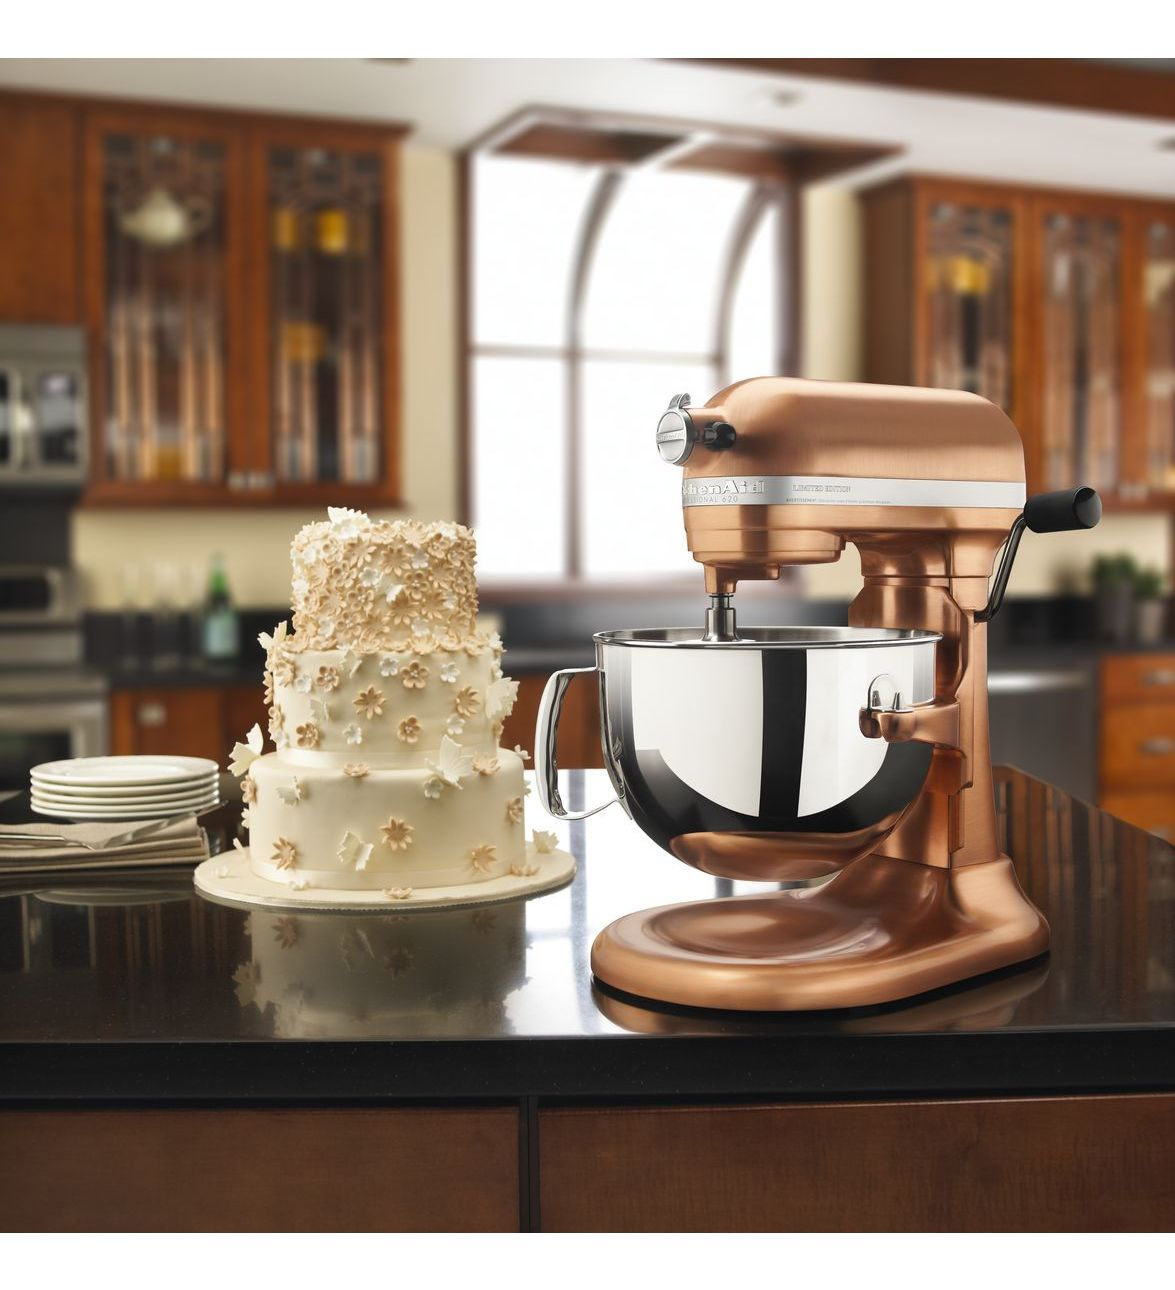 KitchenAid Professional 620 6 Quart Bowl Lift Stand Mixer, In Satin Copper!